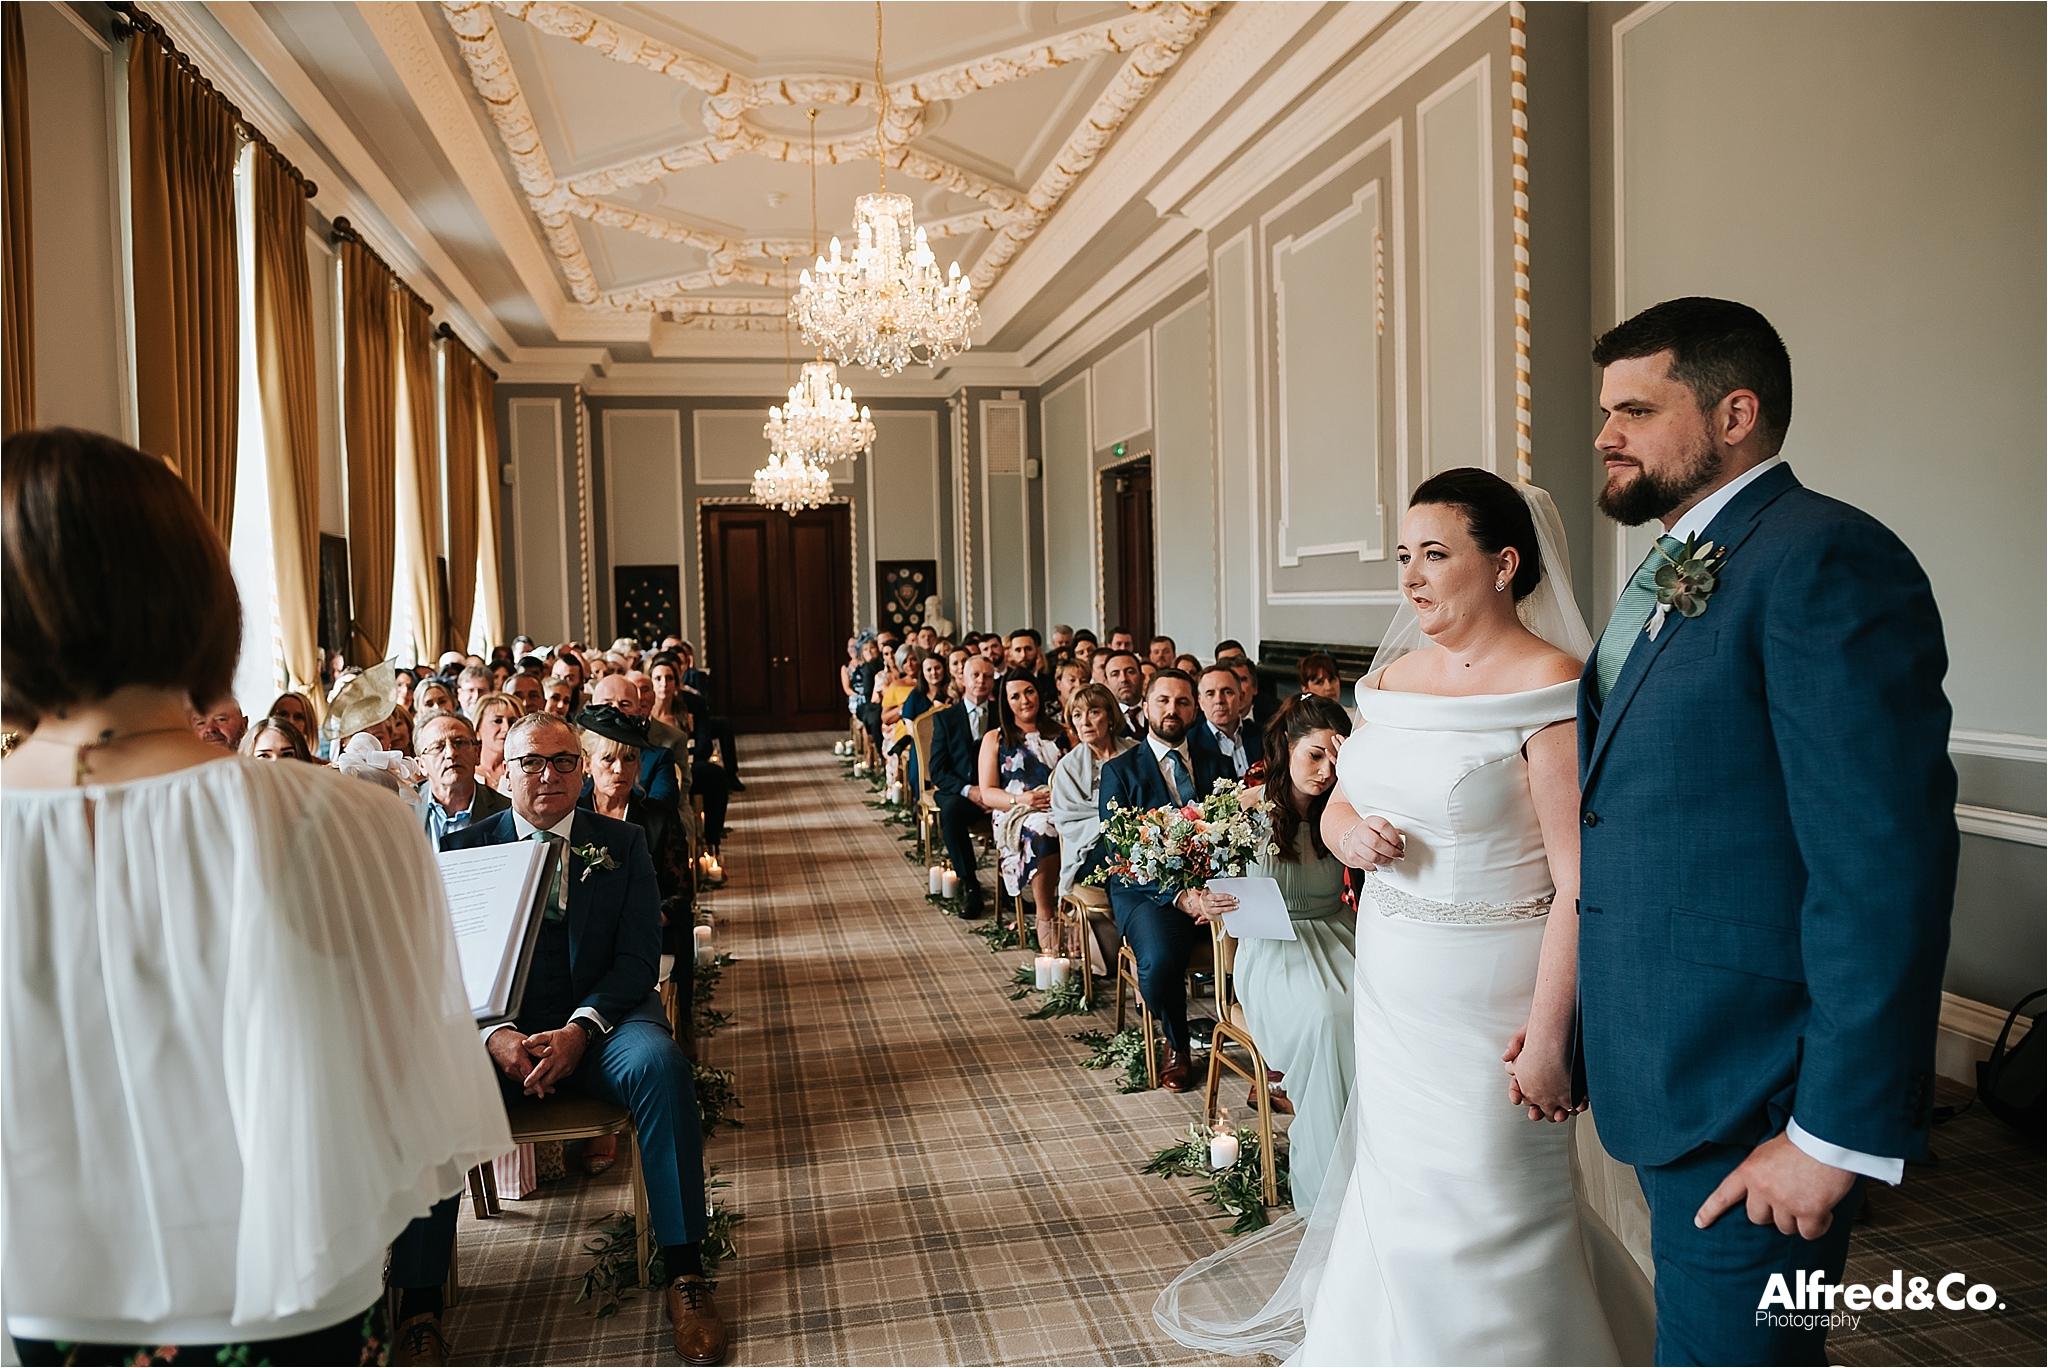 Manchester Halls Wedding Photography_0011.jpg